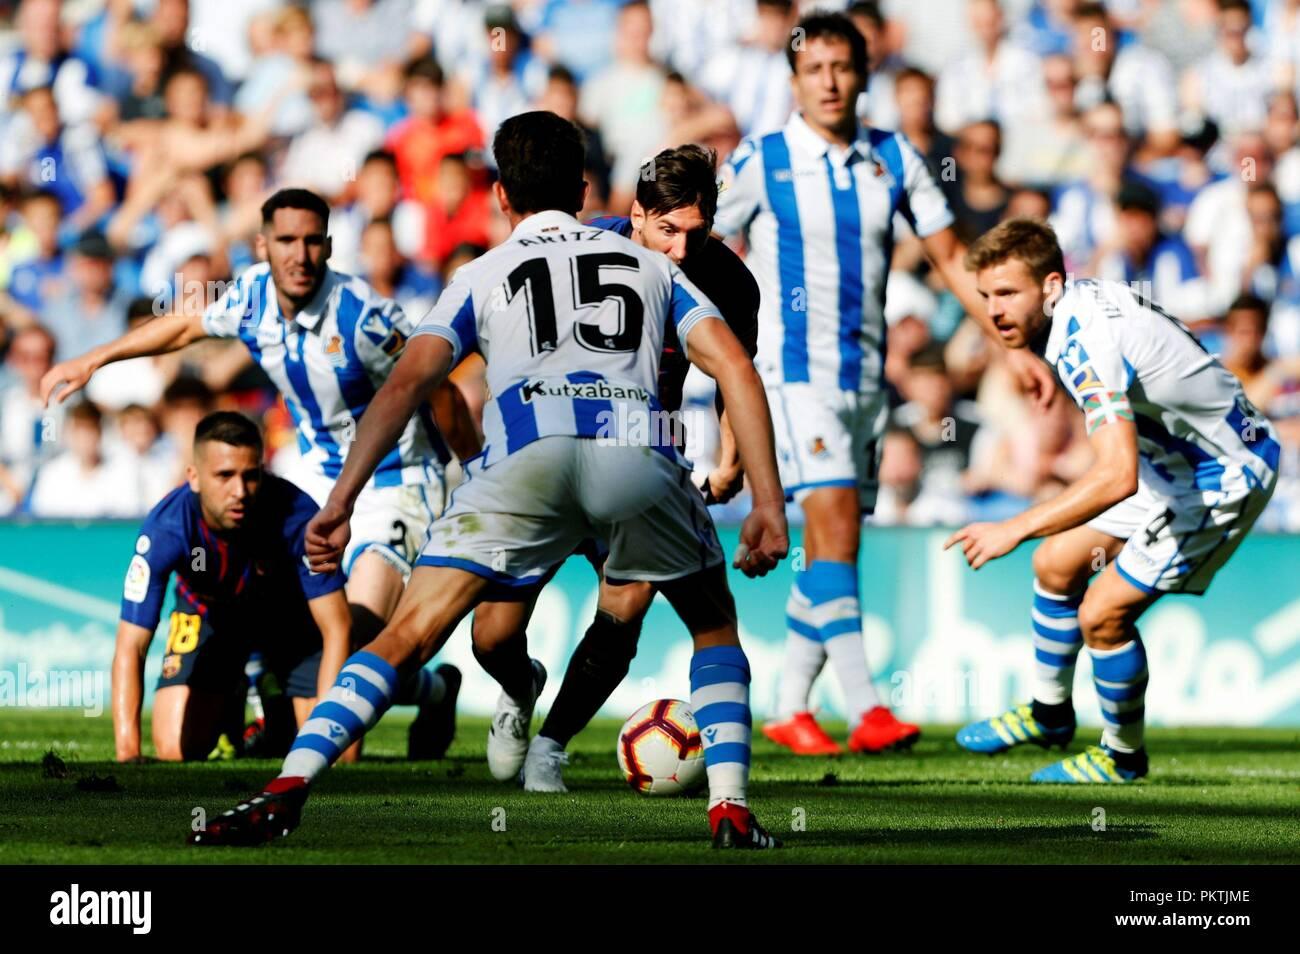 san sebastian, spain 15th sep, 2018 fc barcelona's spanish primera division primera division c 15 #15